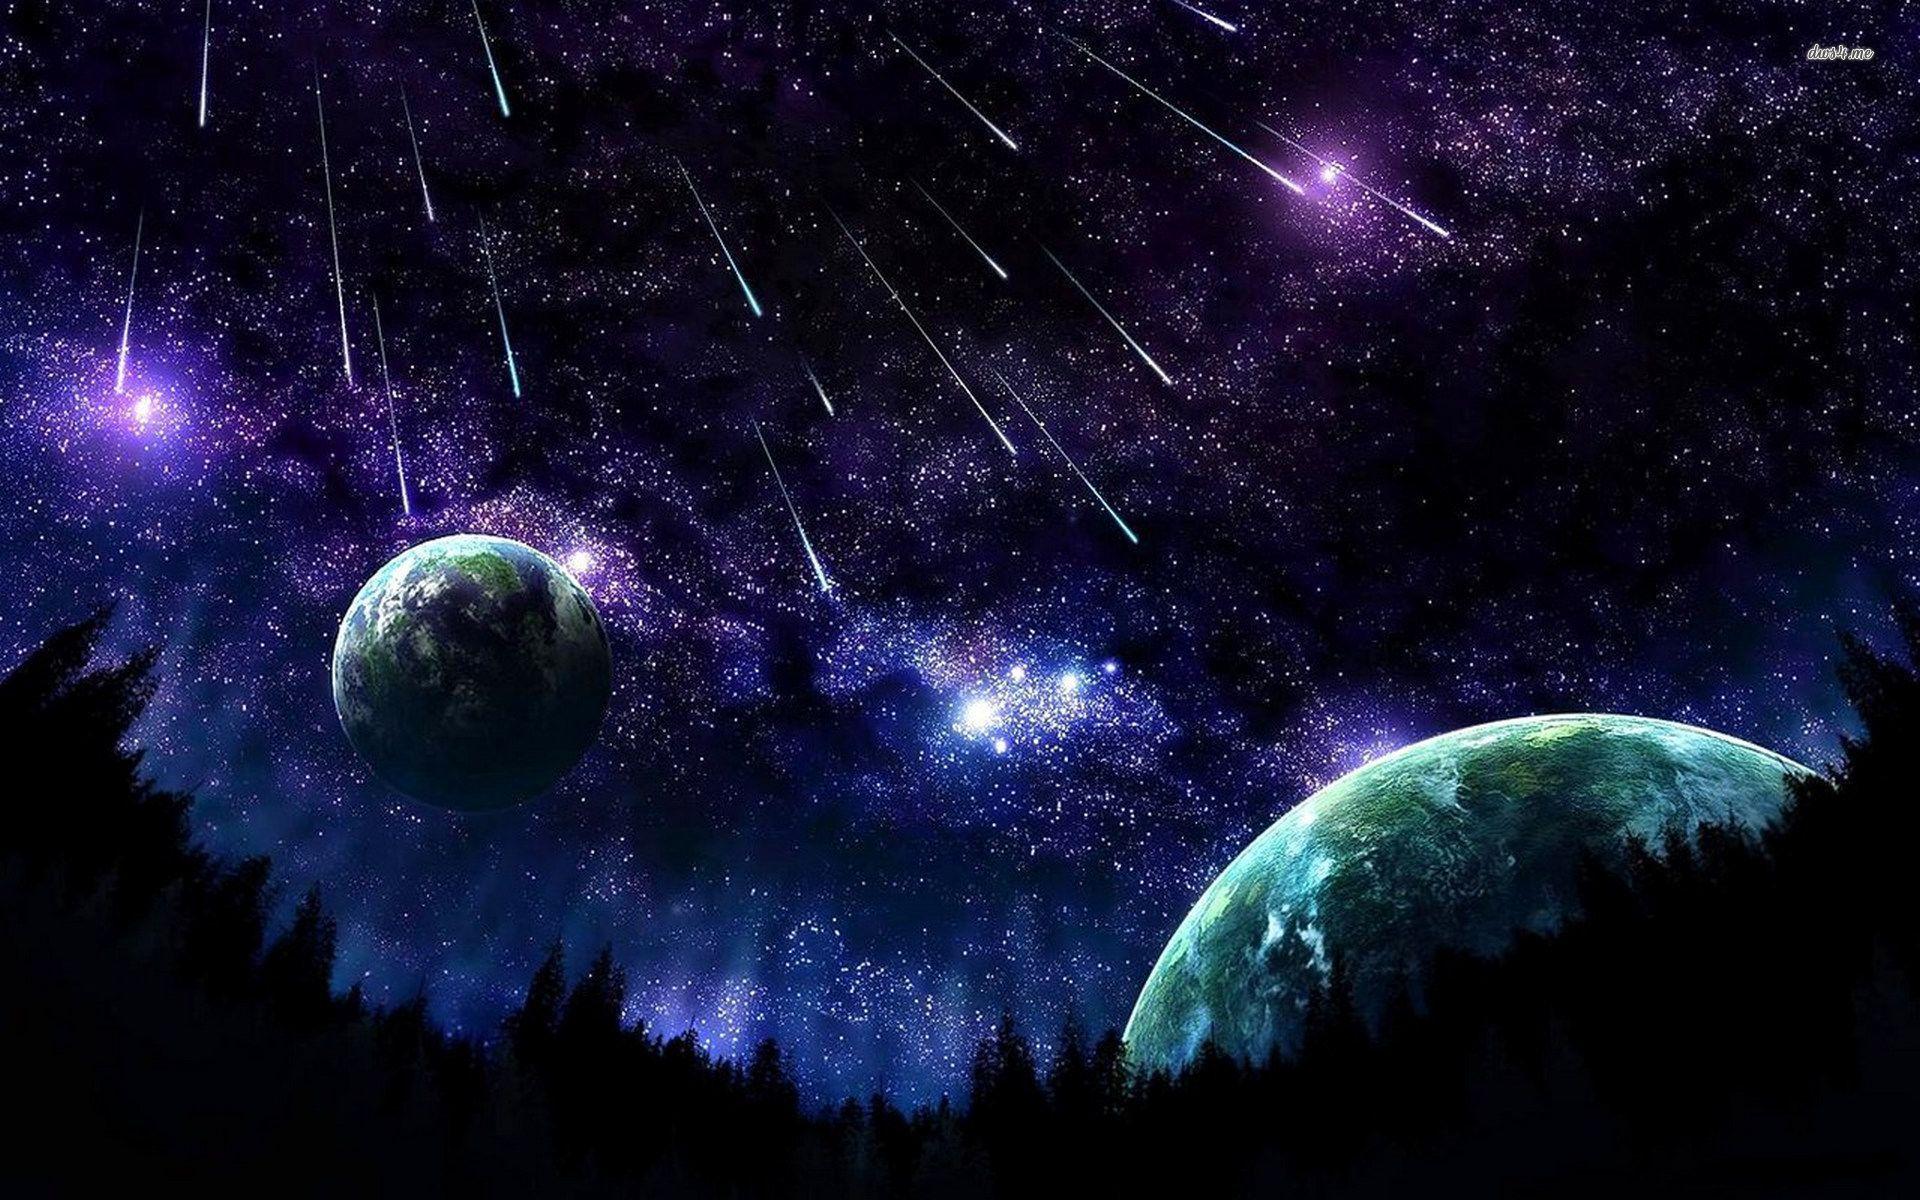 Night Sky Stars Wallpaper Wallpaper Panda Night Sky Wallpaper Night Sky Stars Night Sky Hd